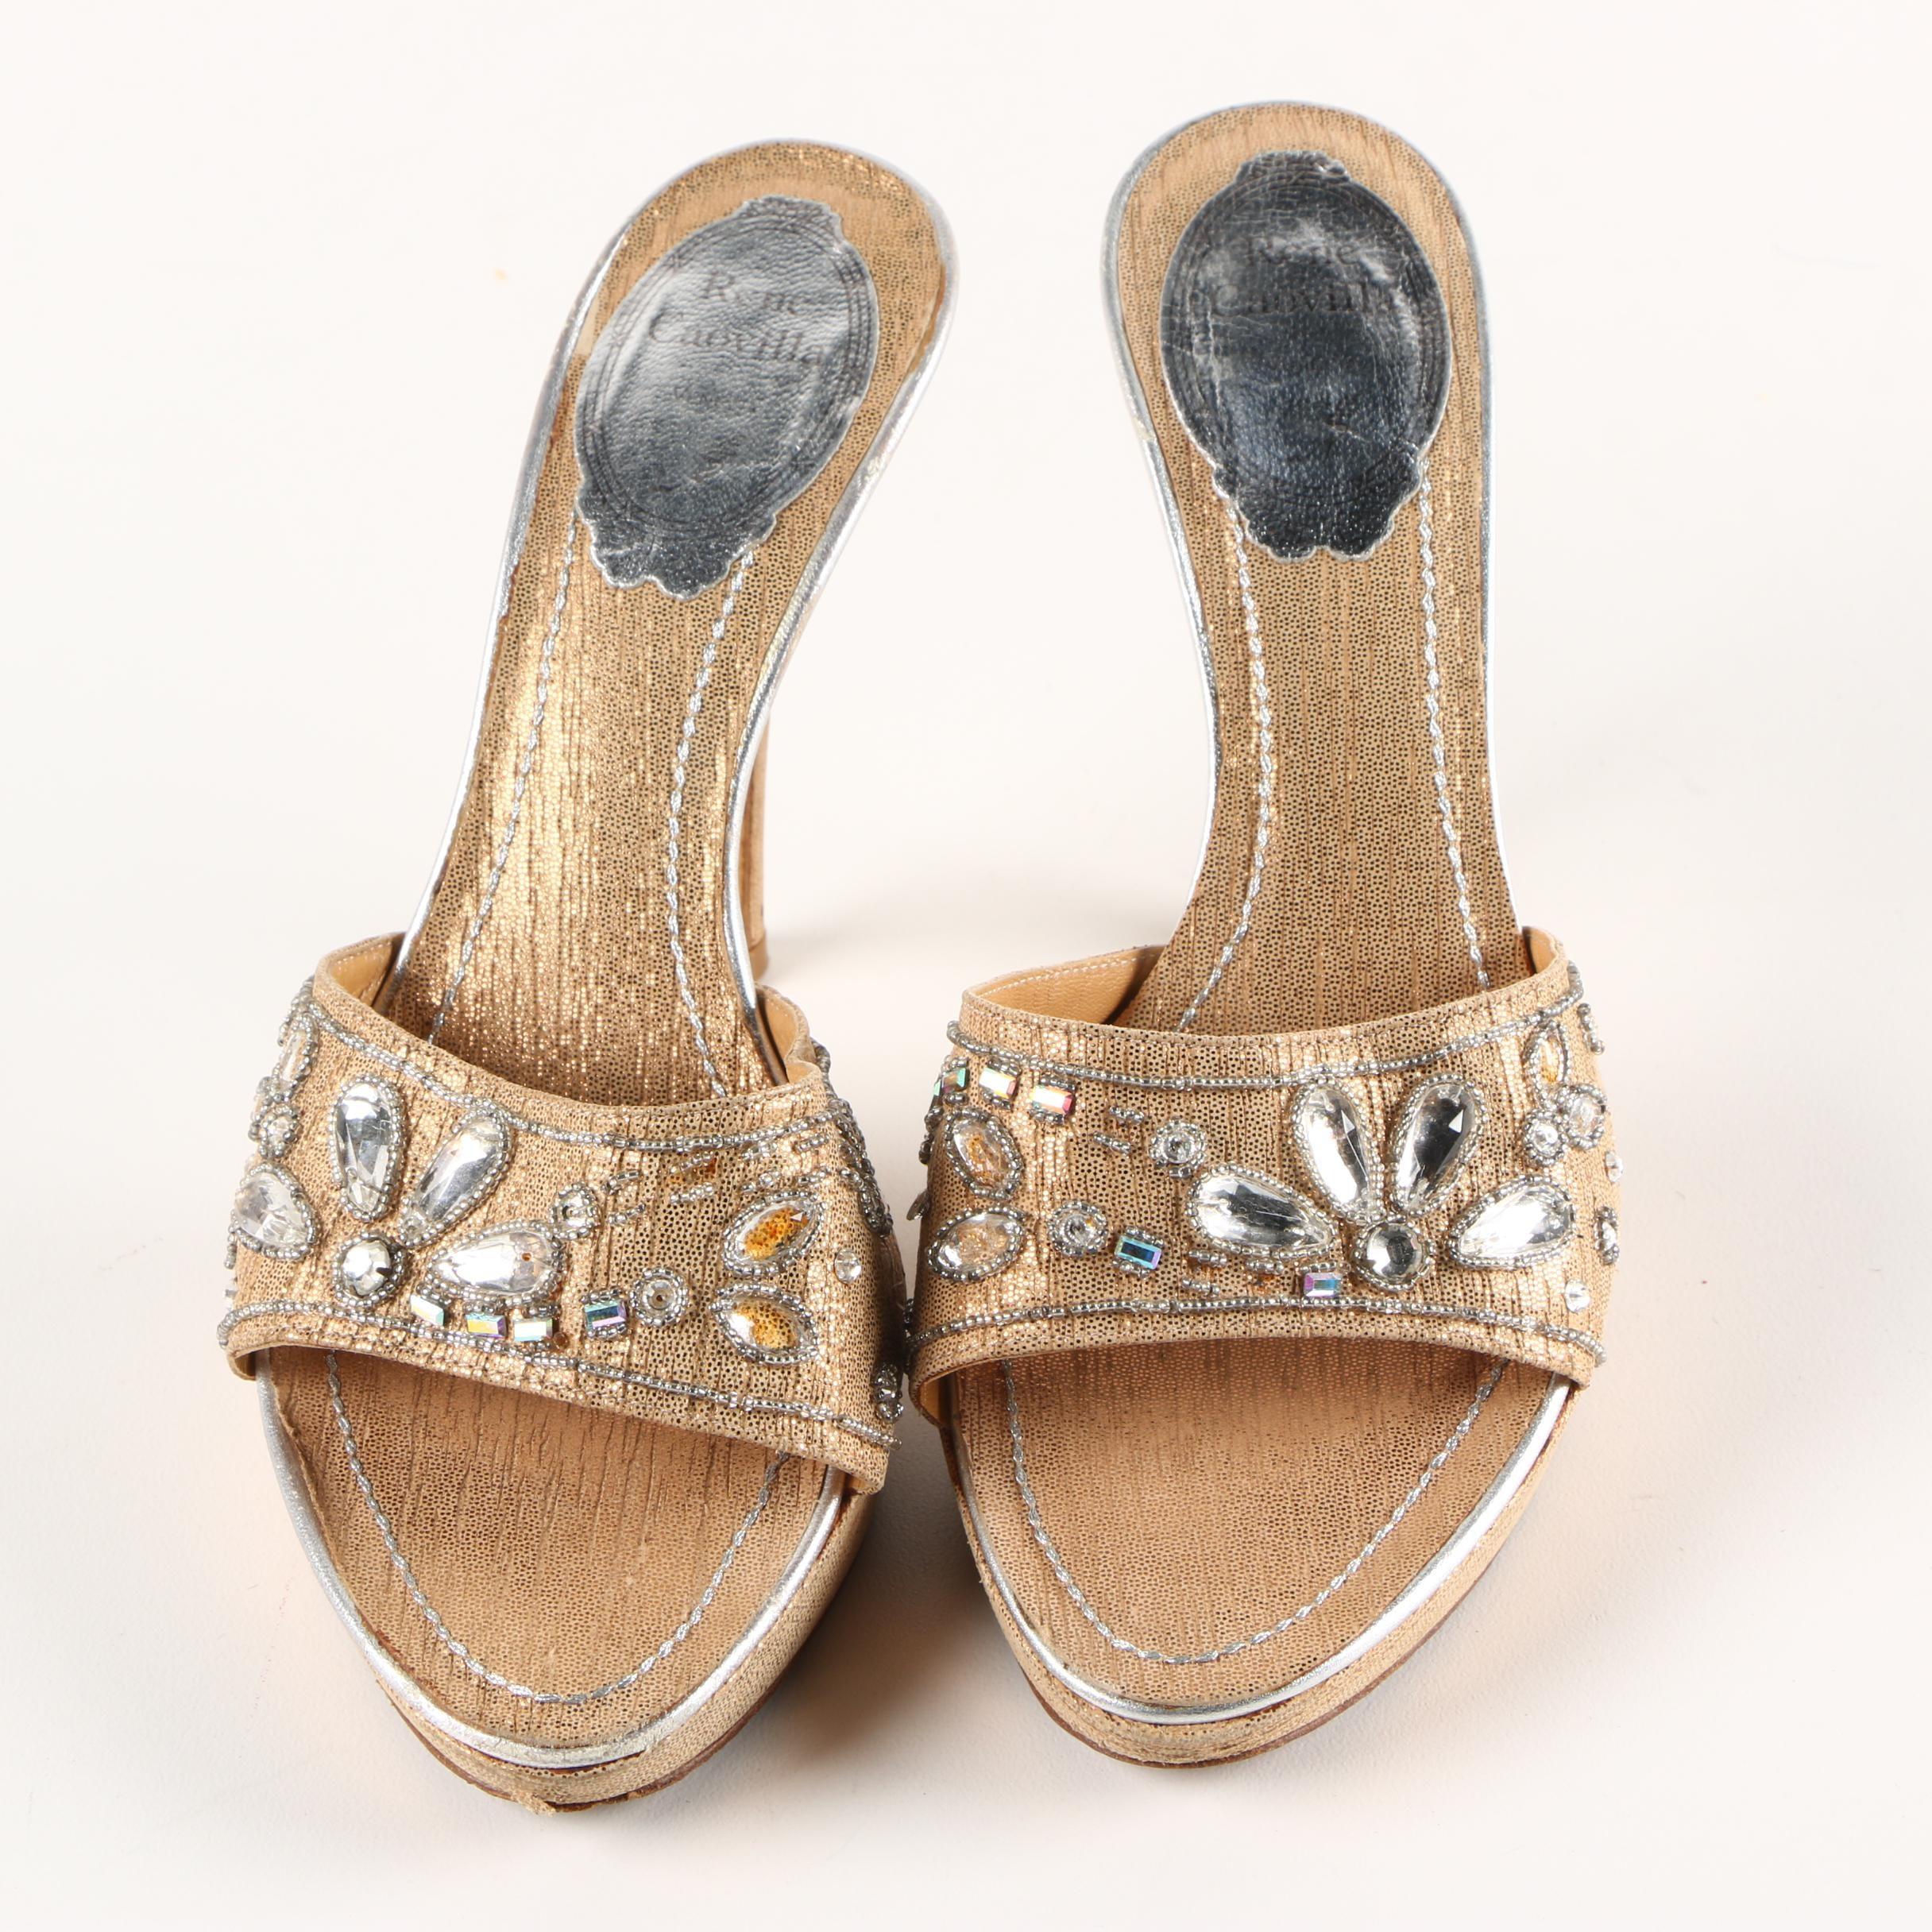 Rene Caovilla Rhinestone and Beaded Slide Heels